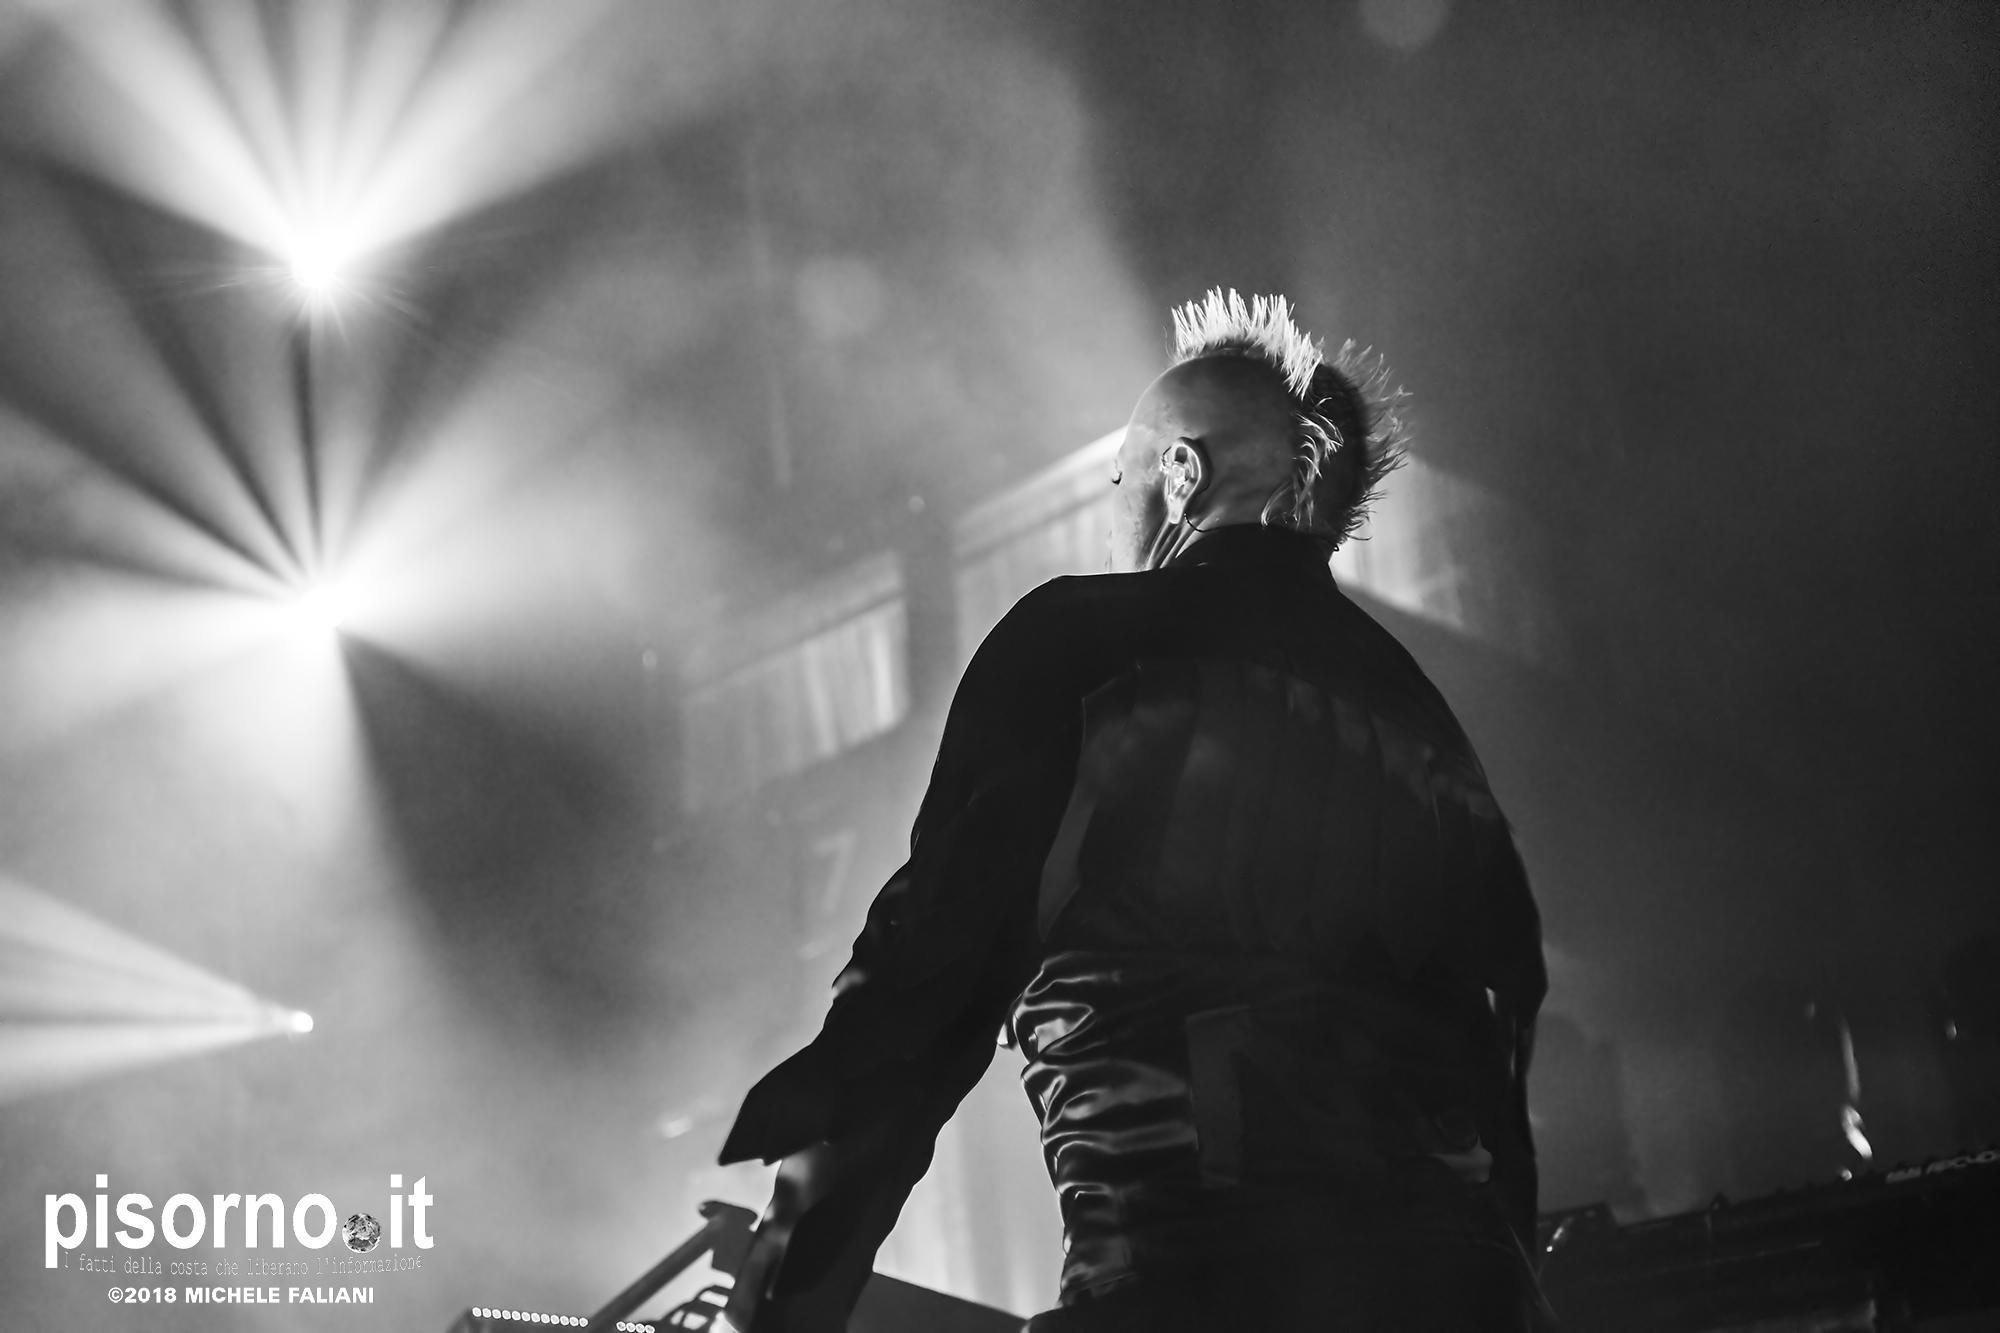 The Prodigy live @ ModiglianiForum (Livorno, Italy), Nov. 30th 2018